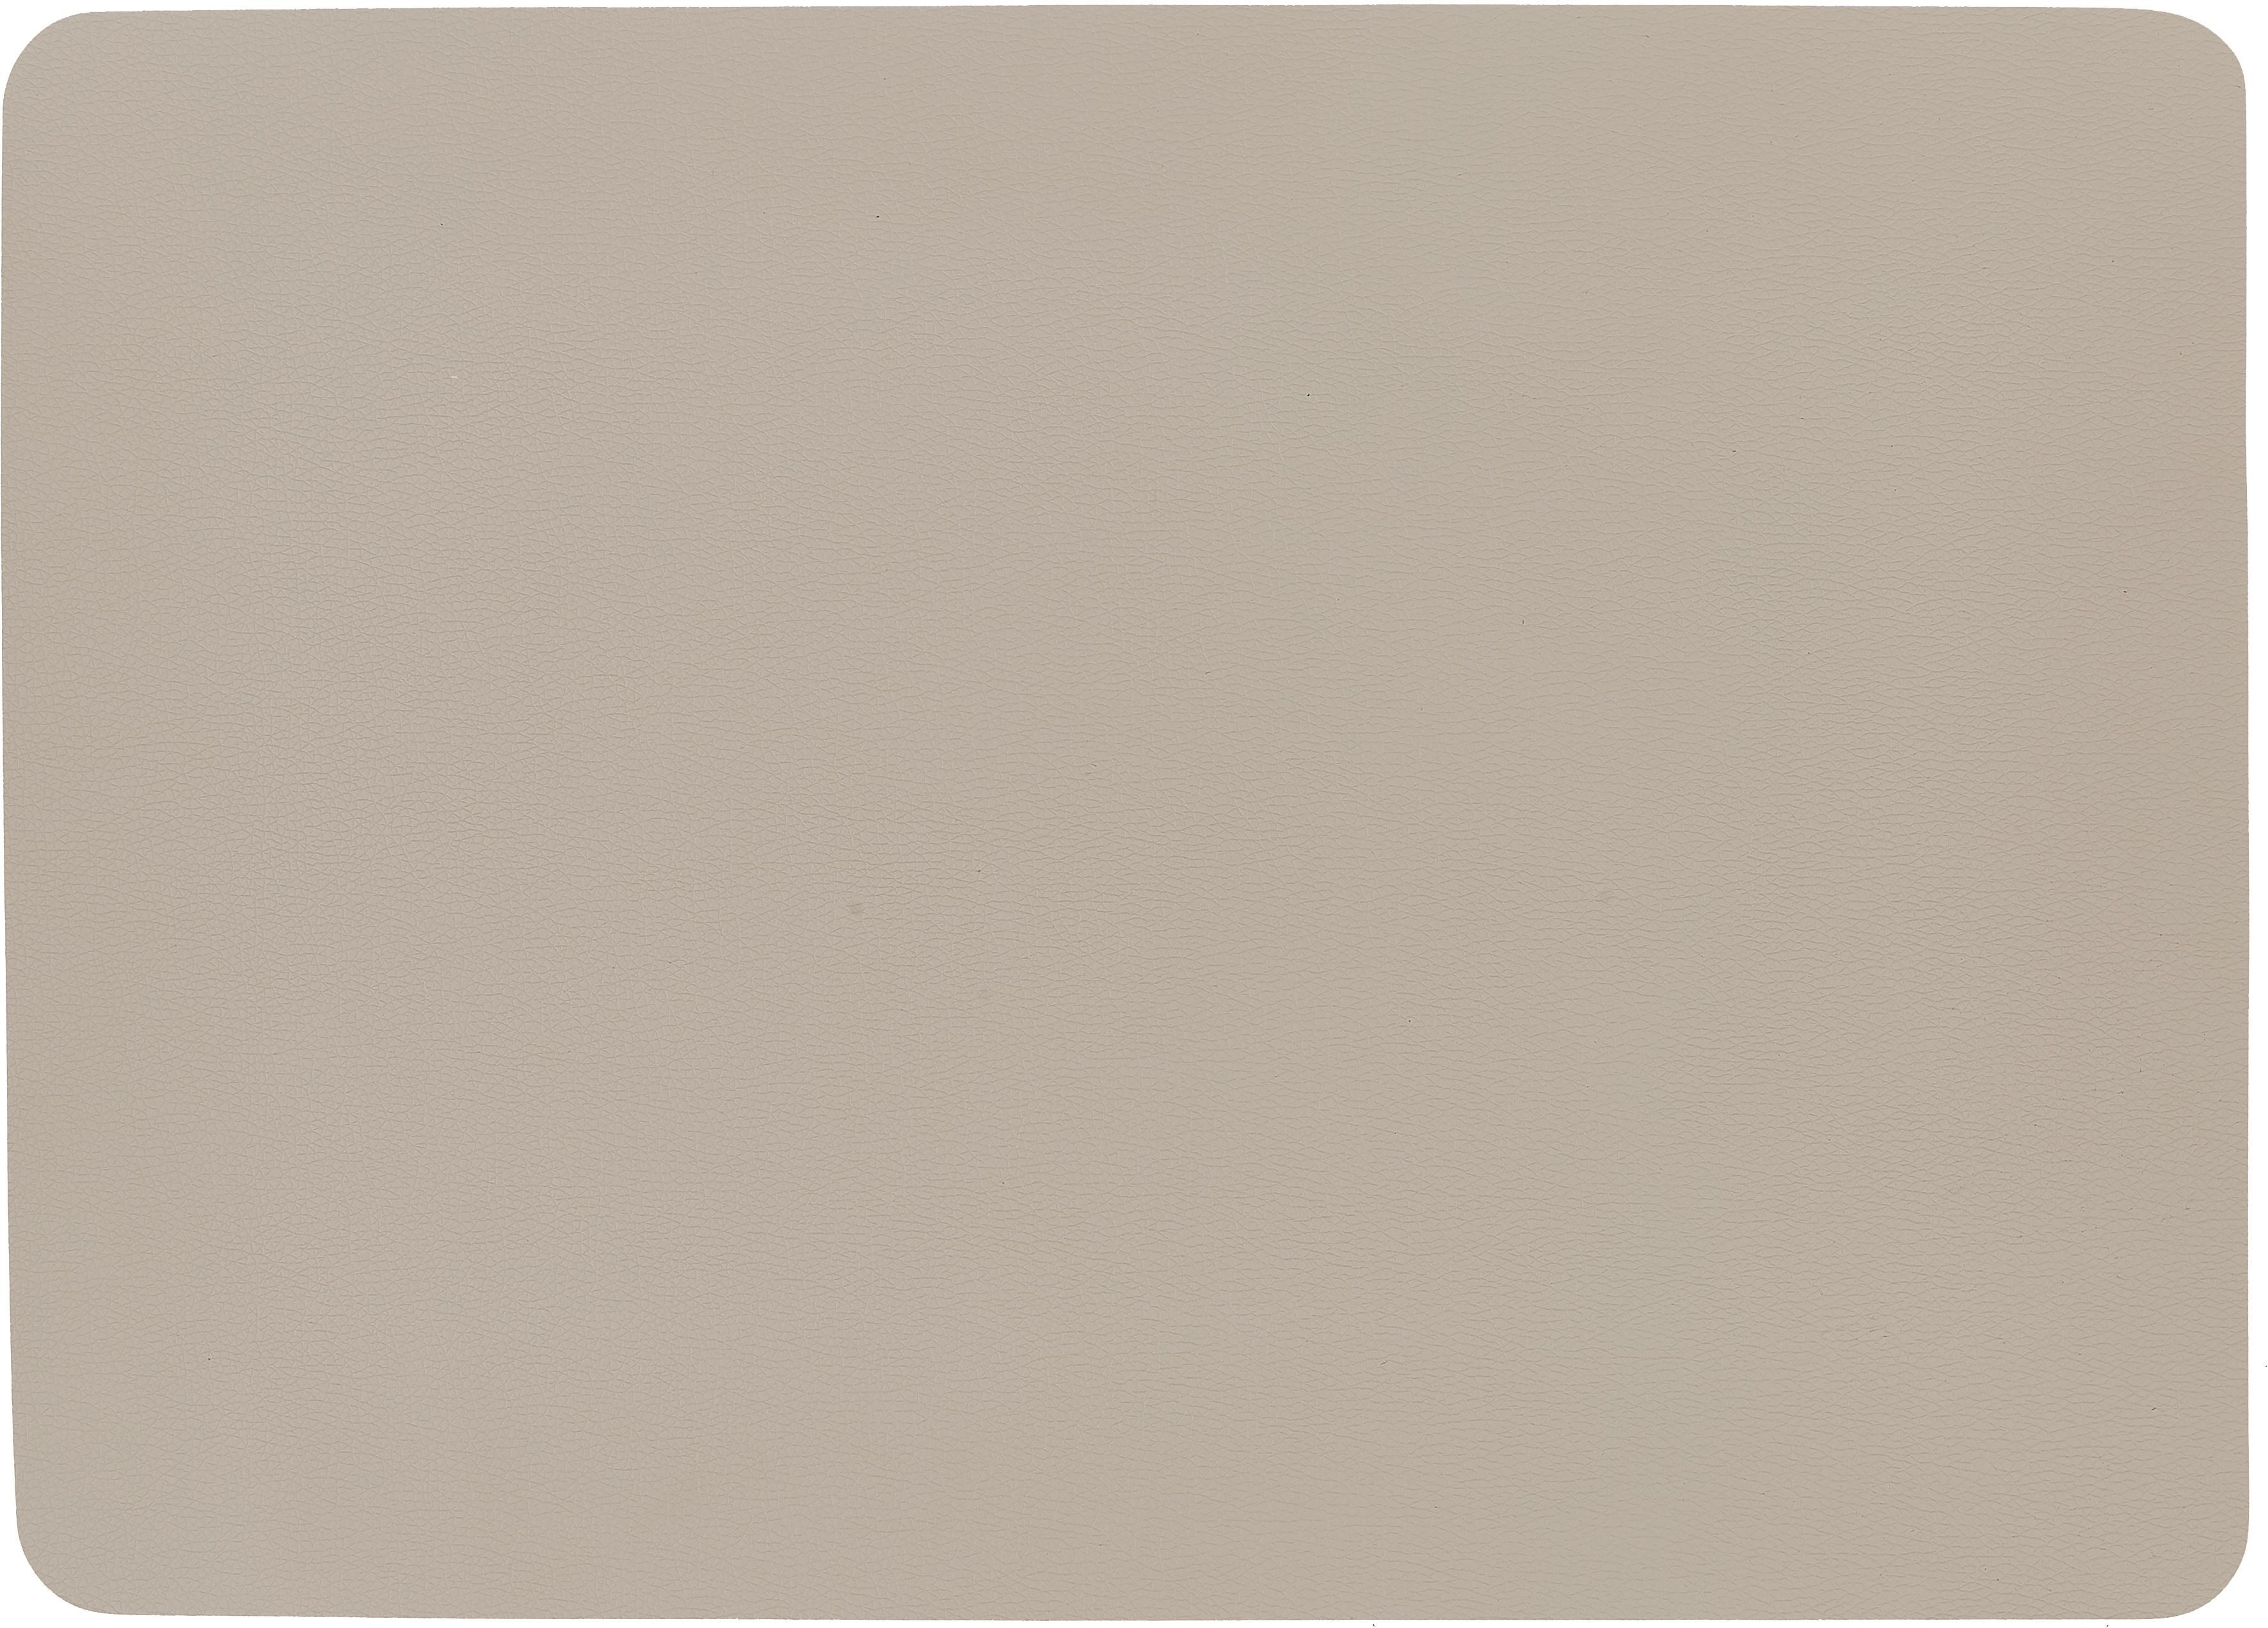 Tovaglietta americana in similpelle Pik 2 pz, Materiale sintetico (PVC), Beige, Larg. 33 x Lung. 46 cm